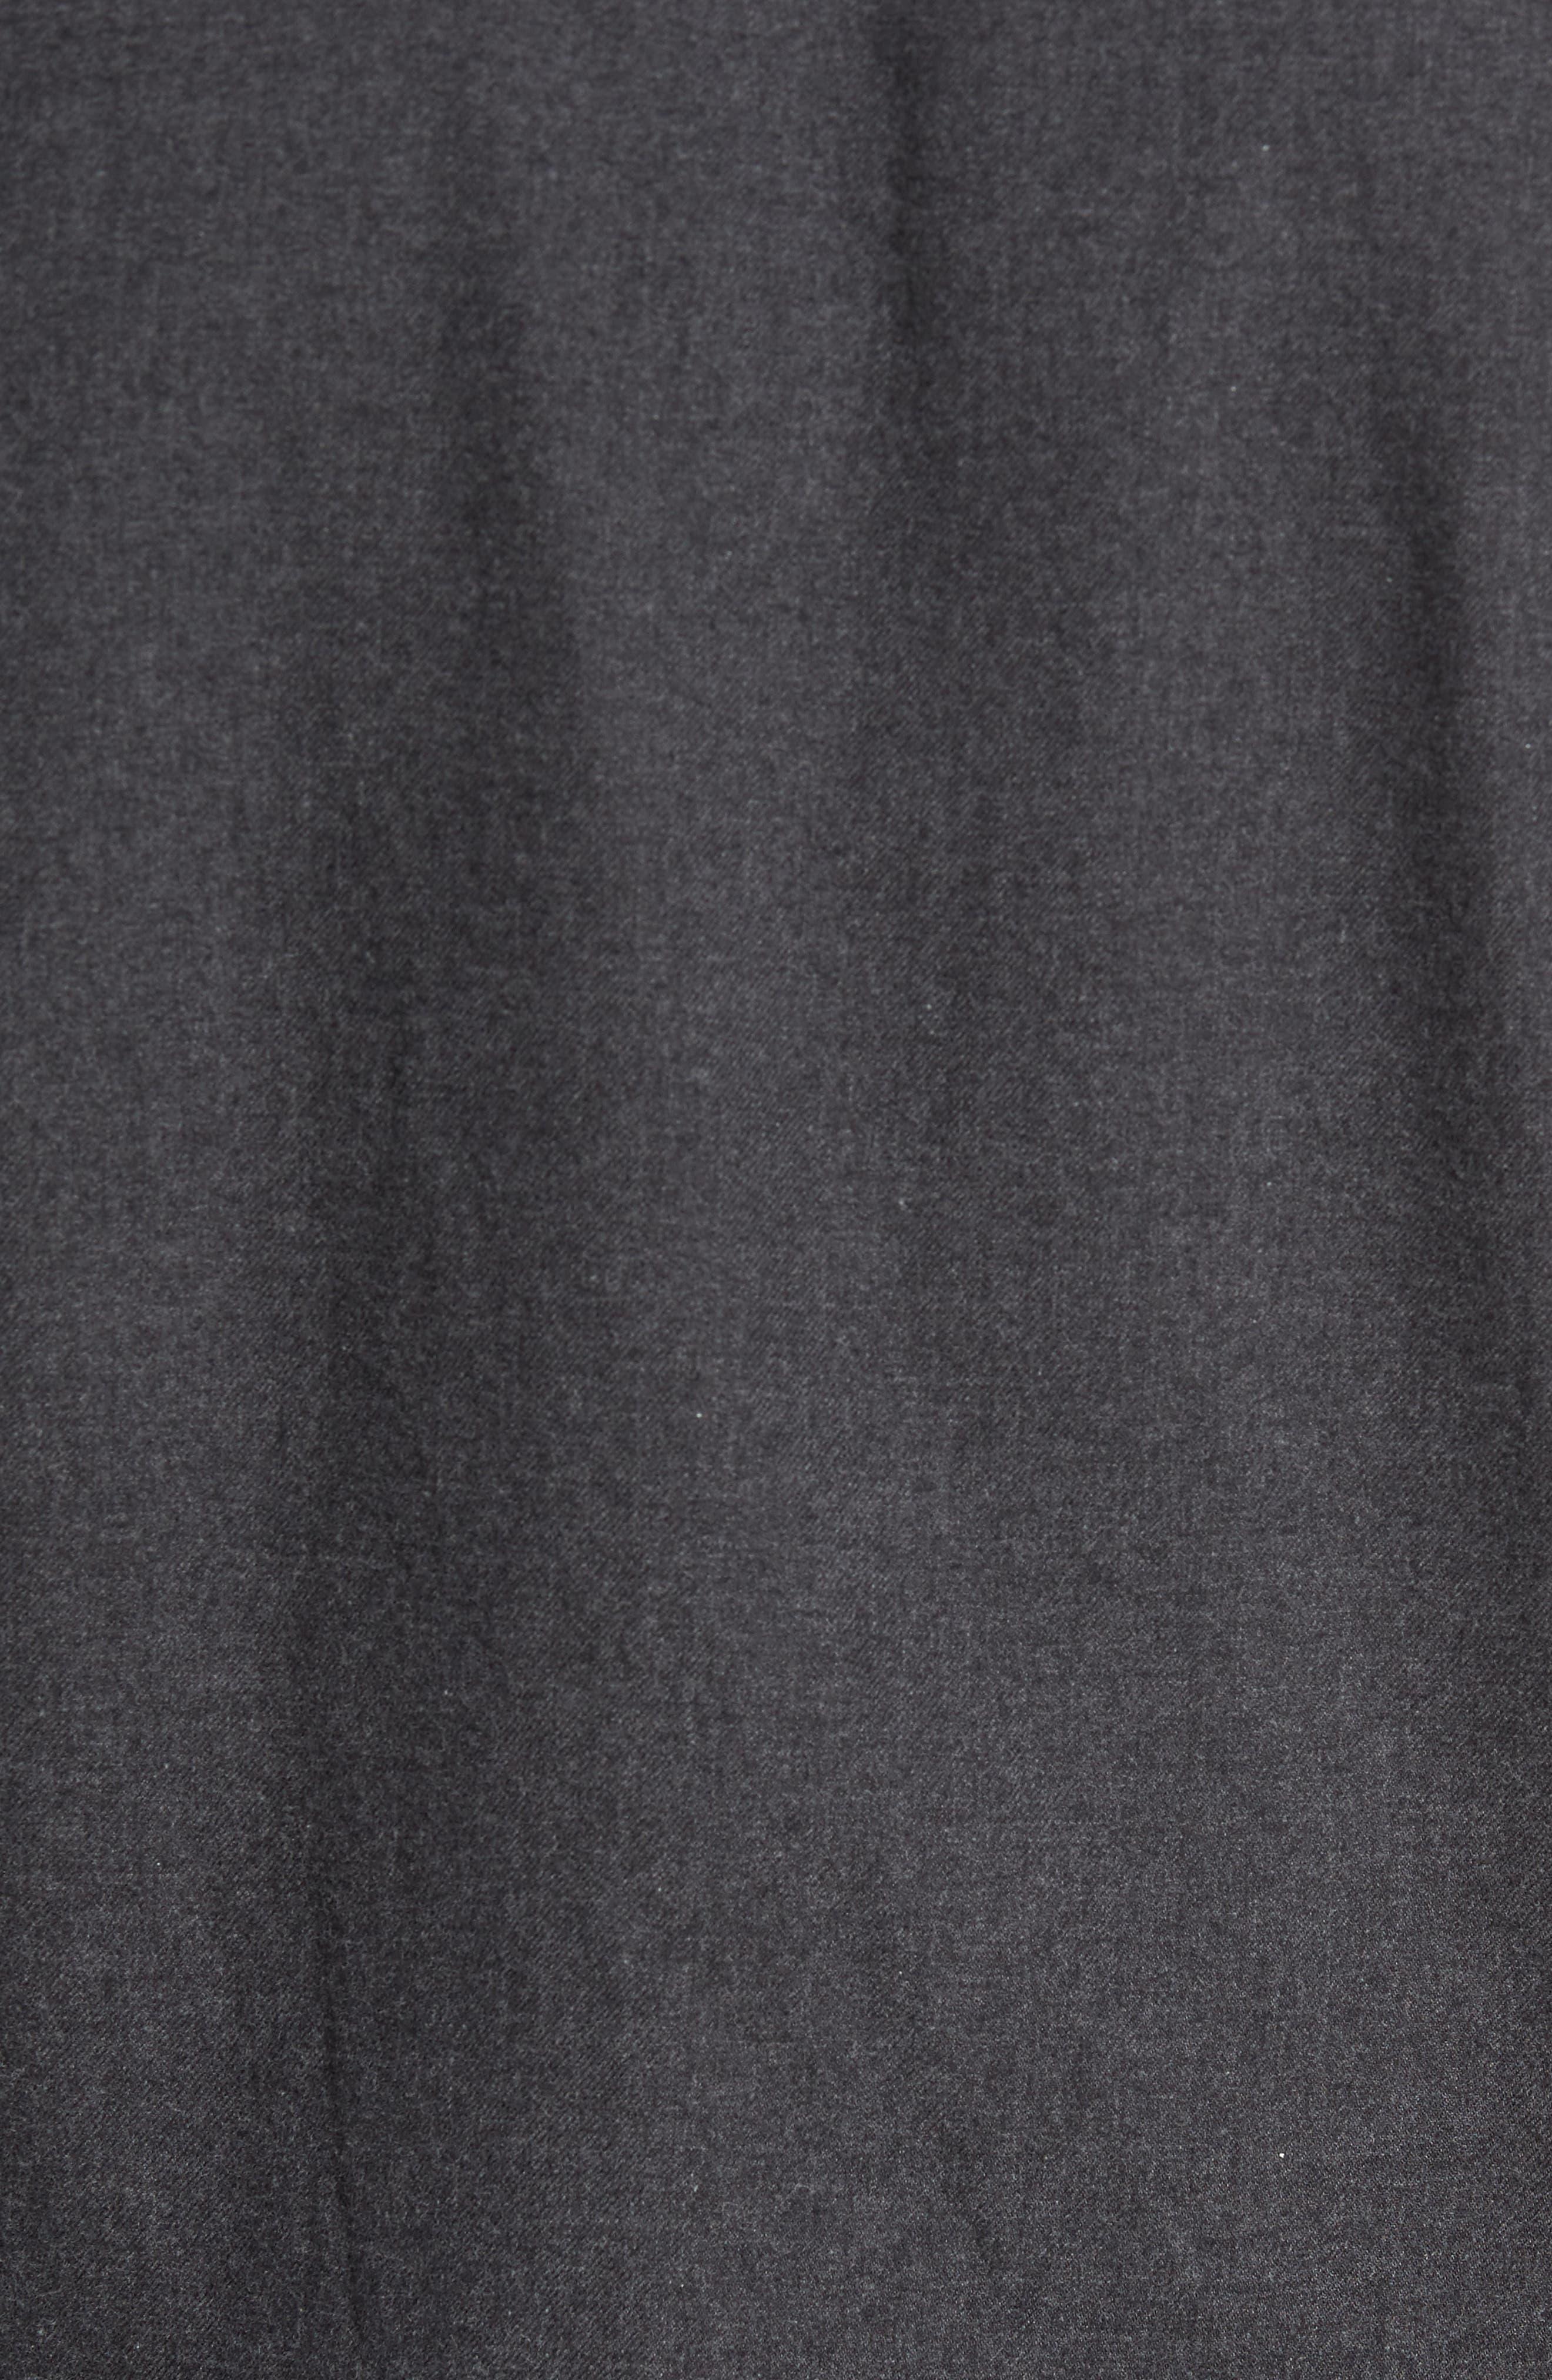 Slim Fit Brushed Twill Sport Shirt,                             Alternate thumbnail 5, color,                             020